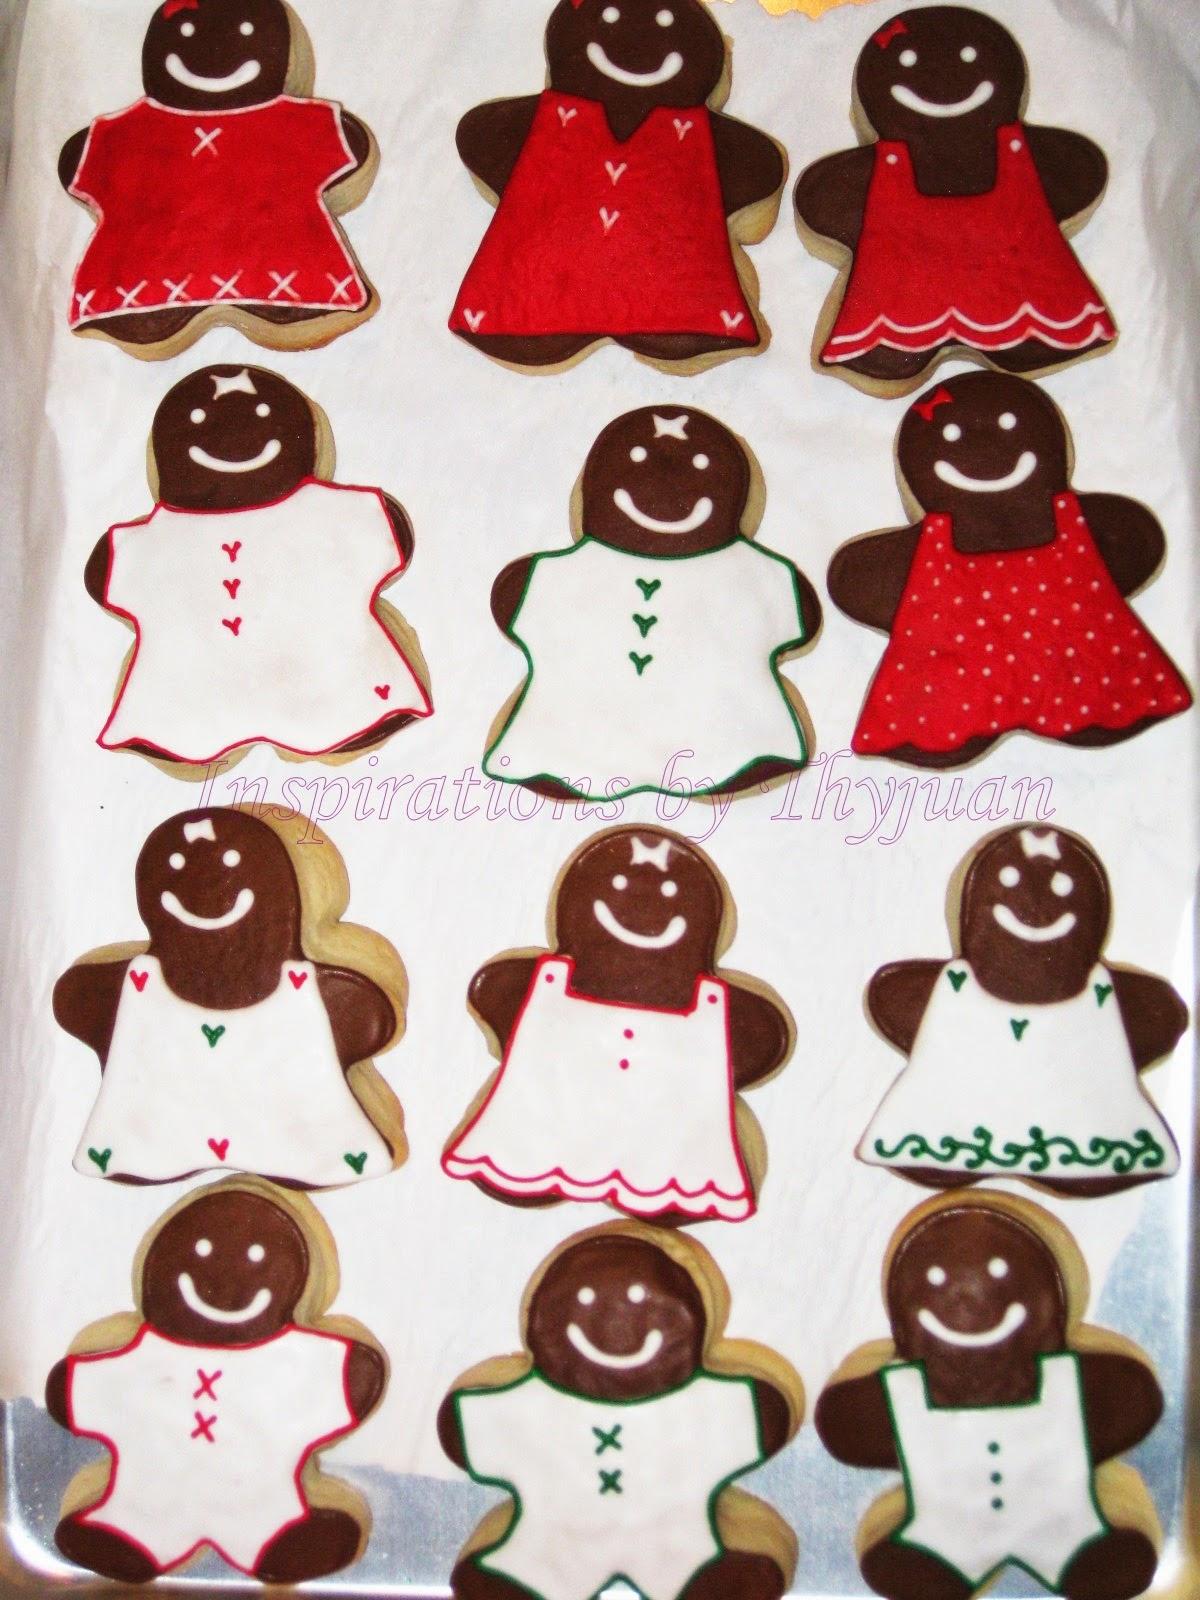 Inspirations By Thyjuan Llc December 2011